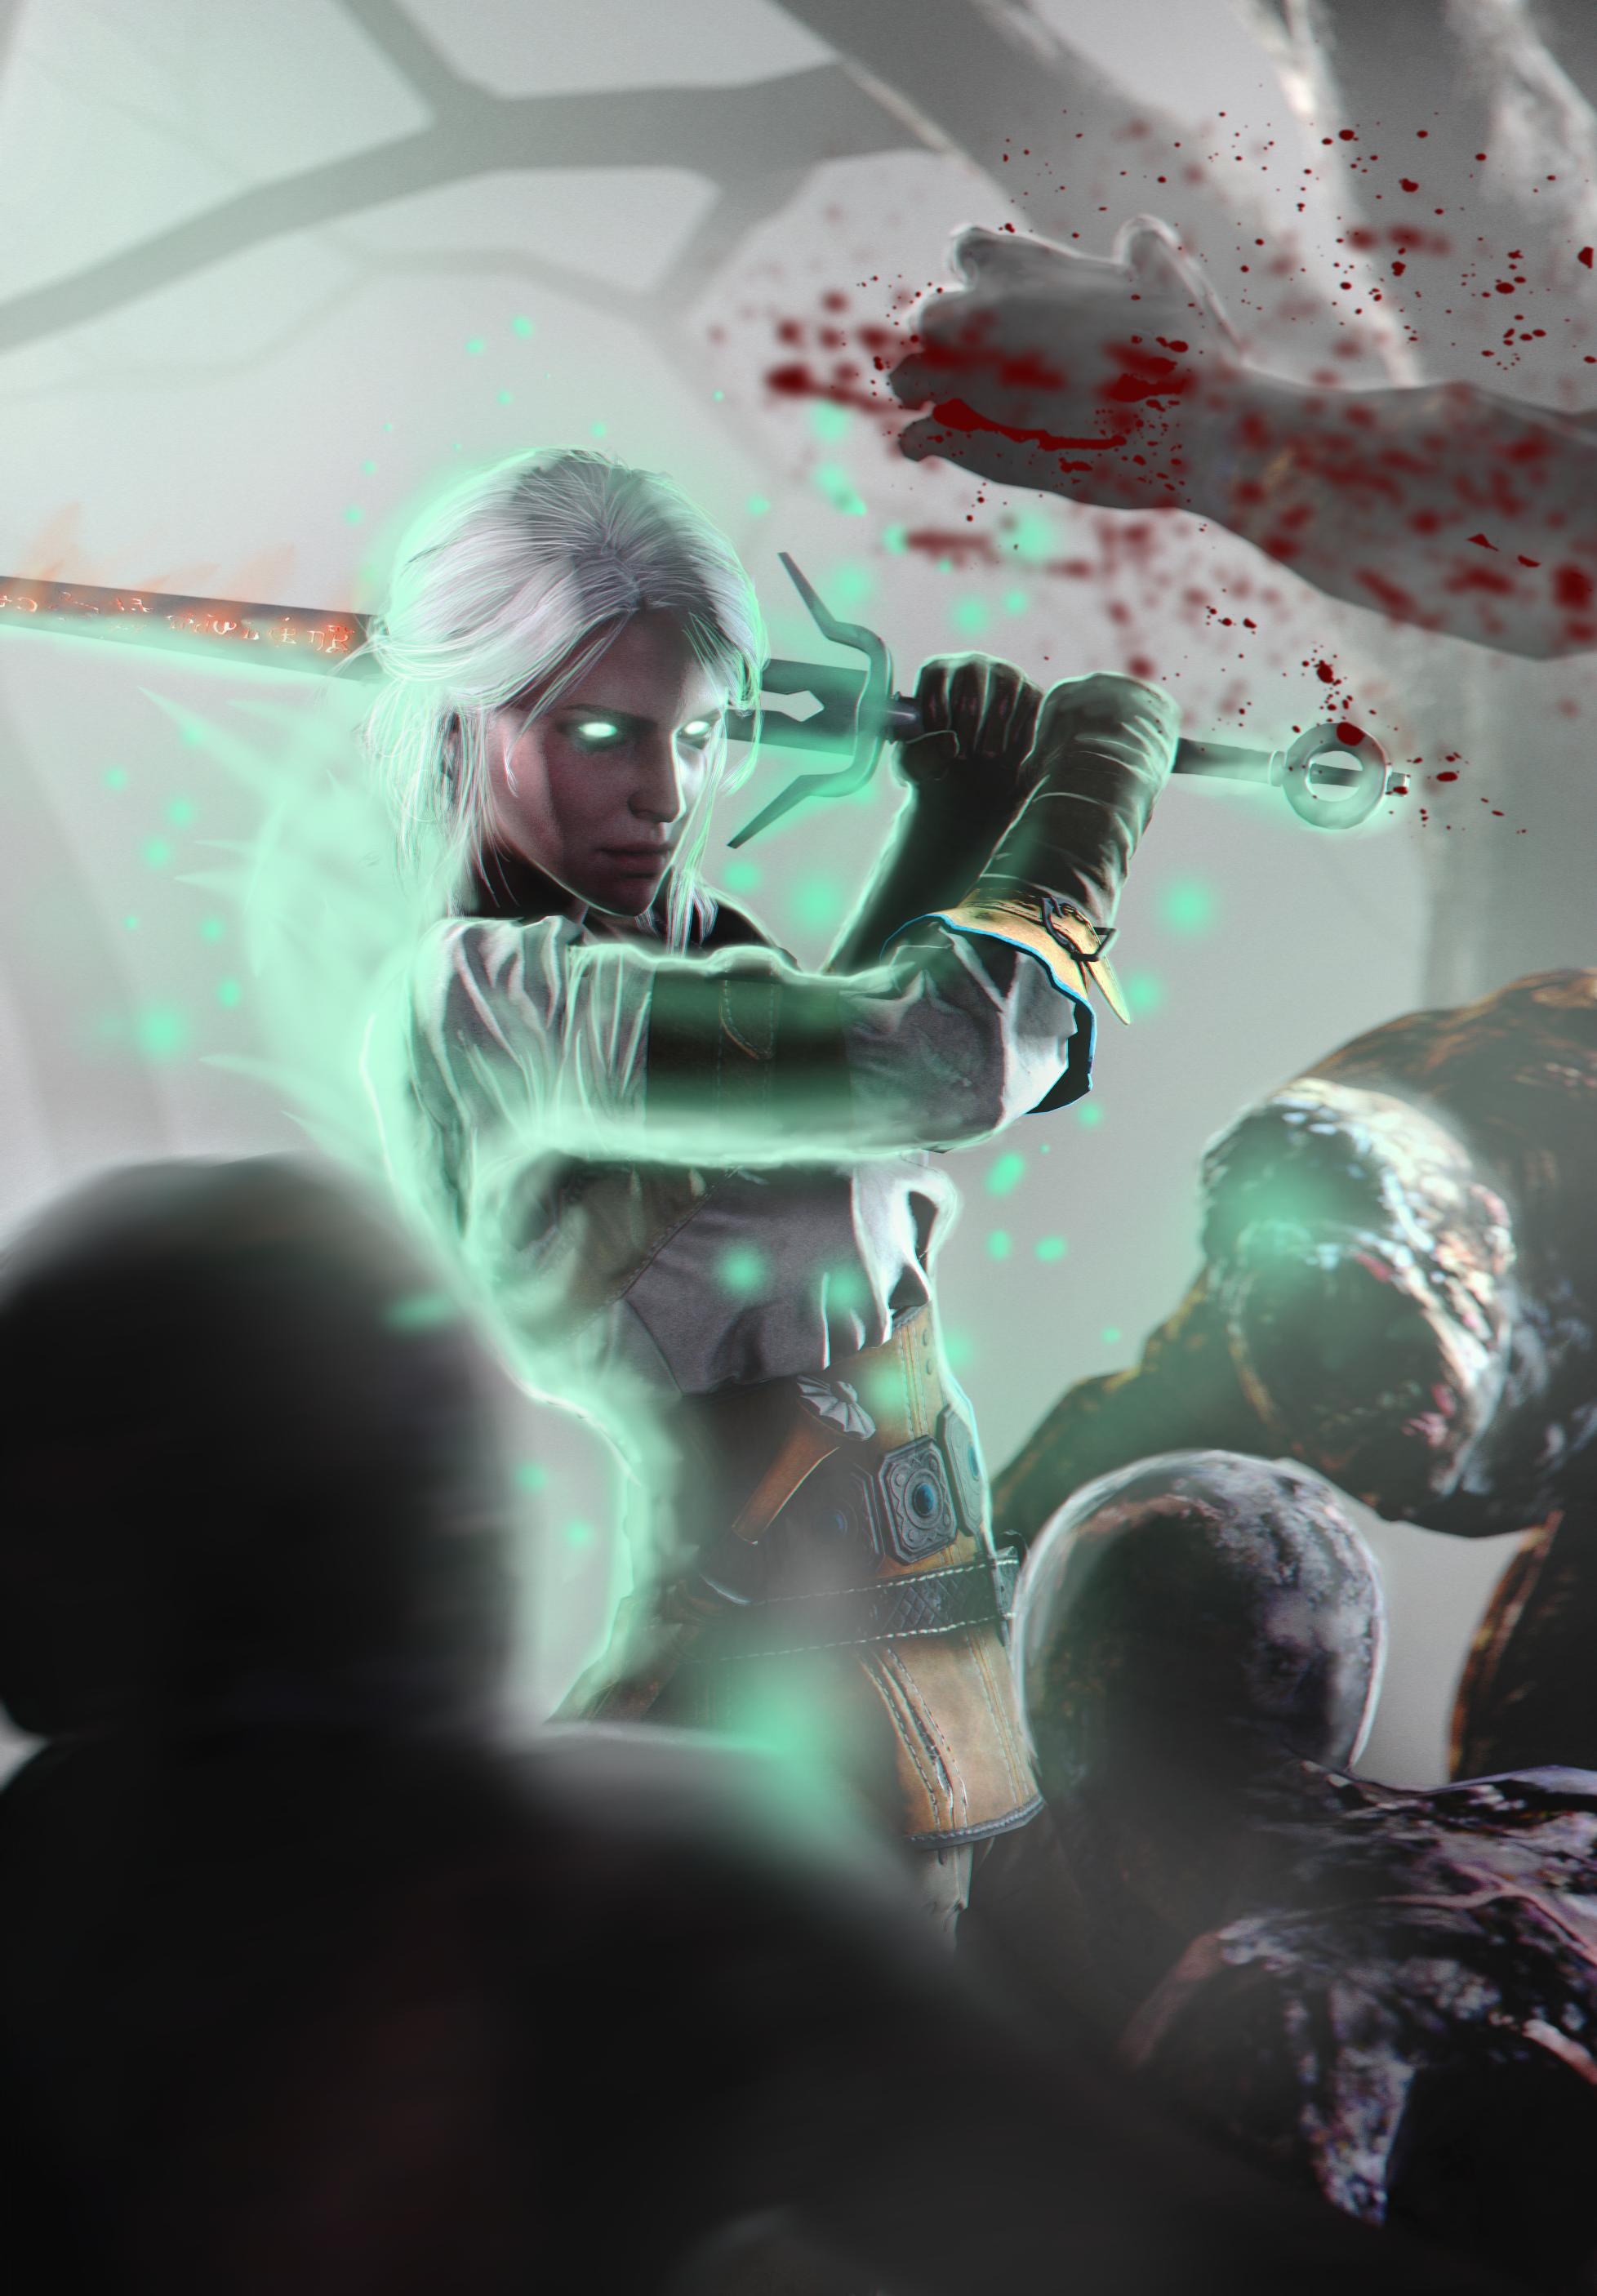 Geralt gwent card ciri remake by ingyuarts on deviantart - Ciri gwent card witcher 3 ...